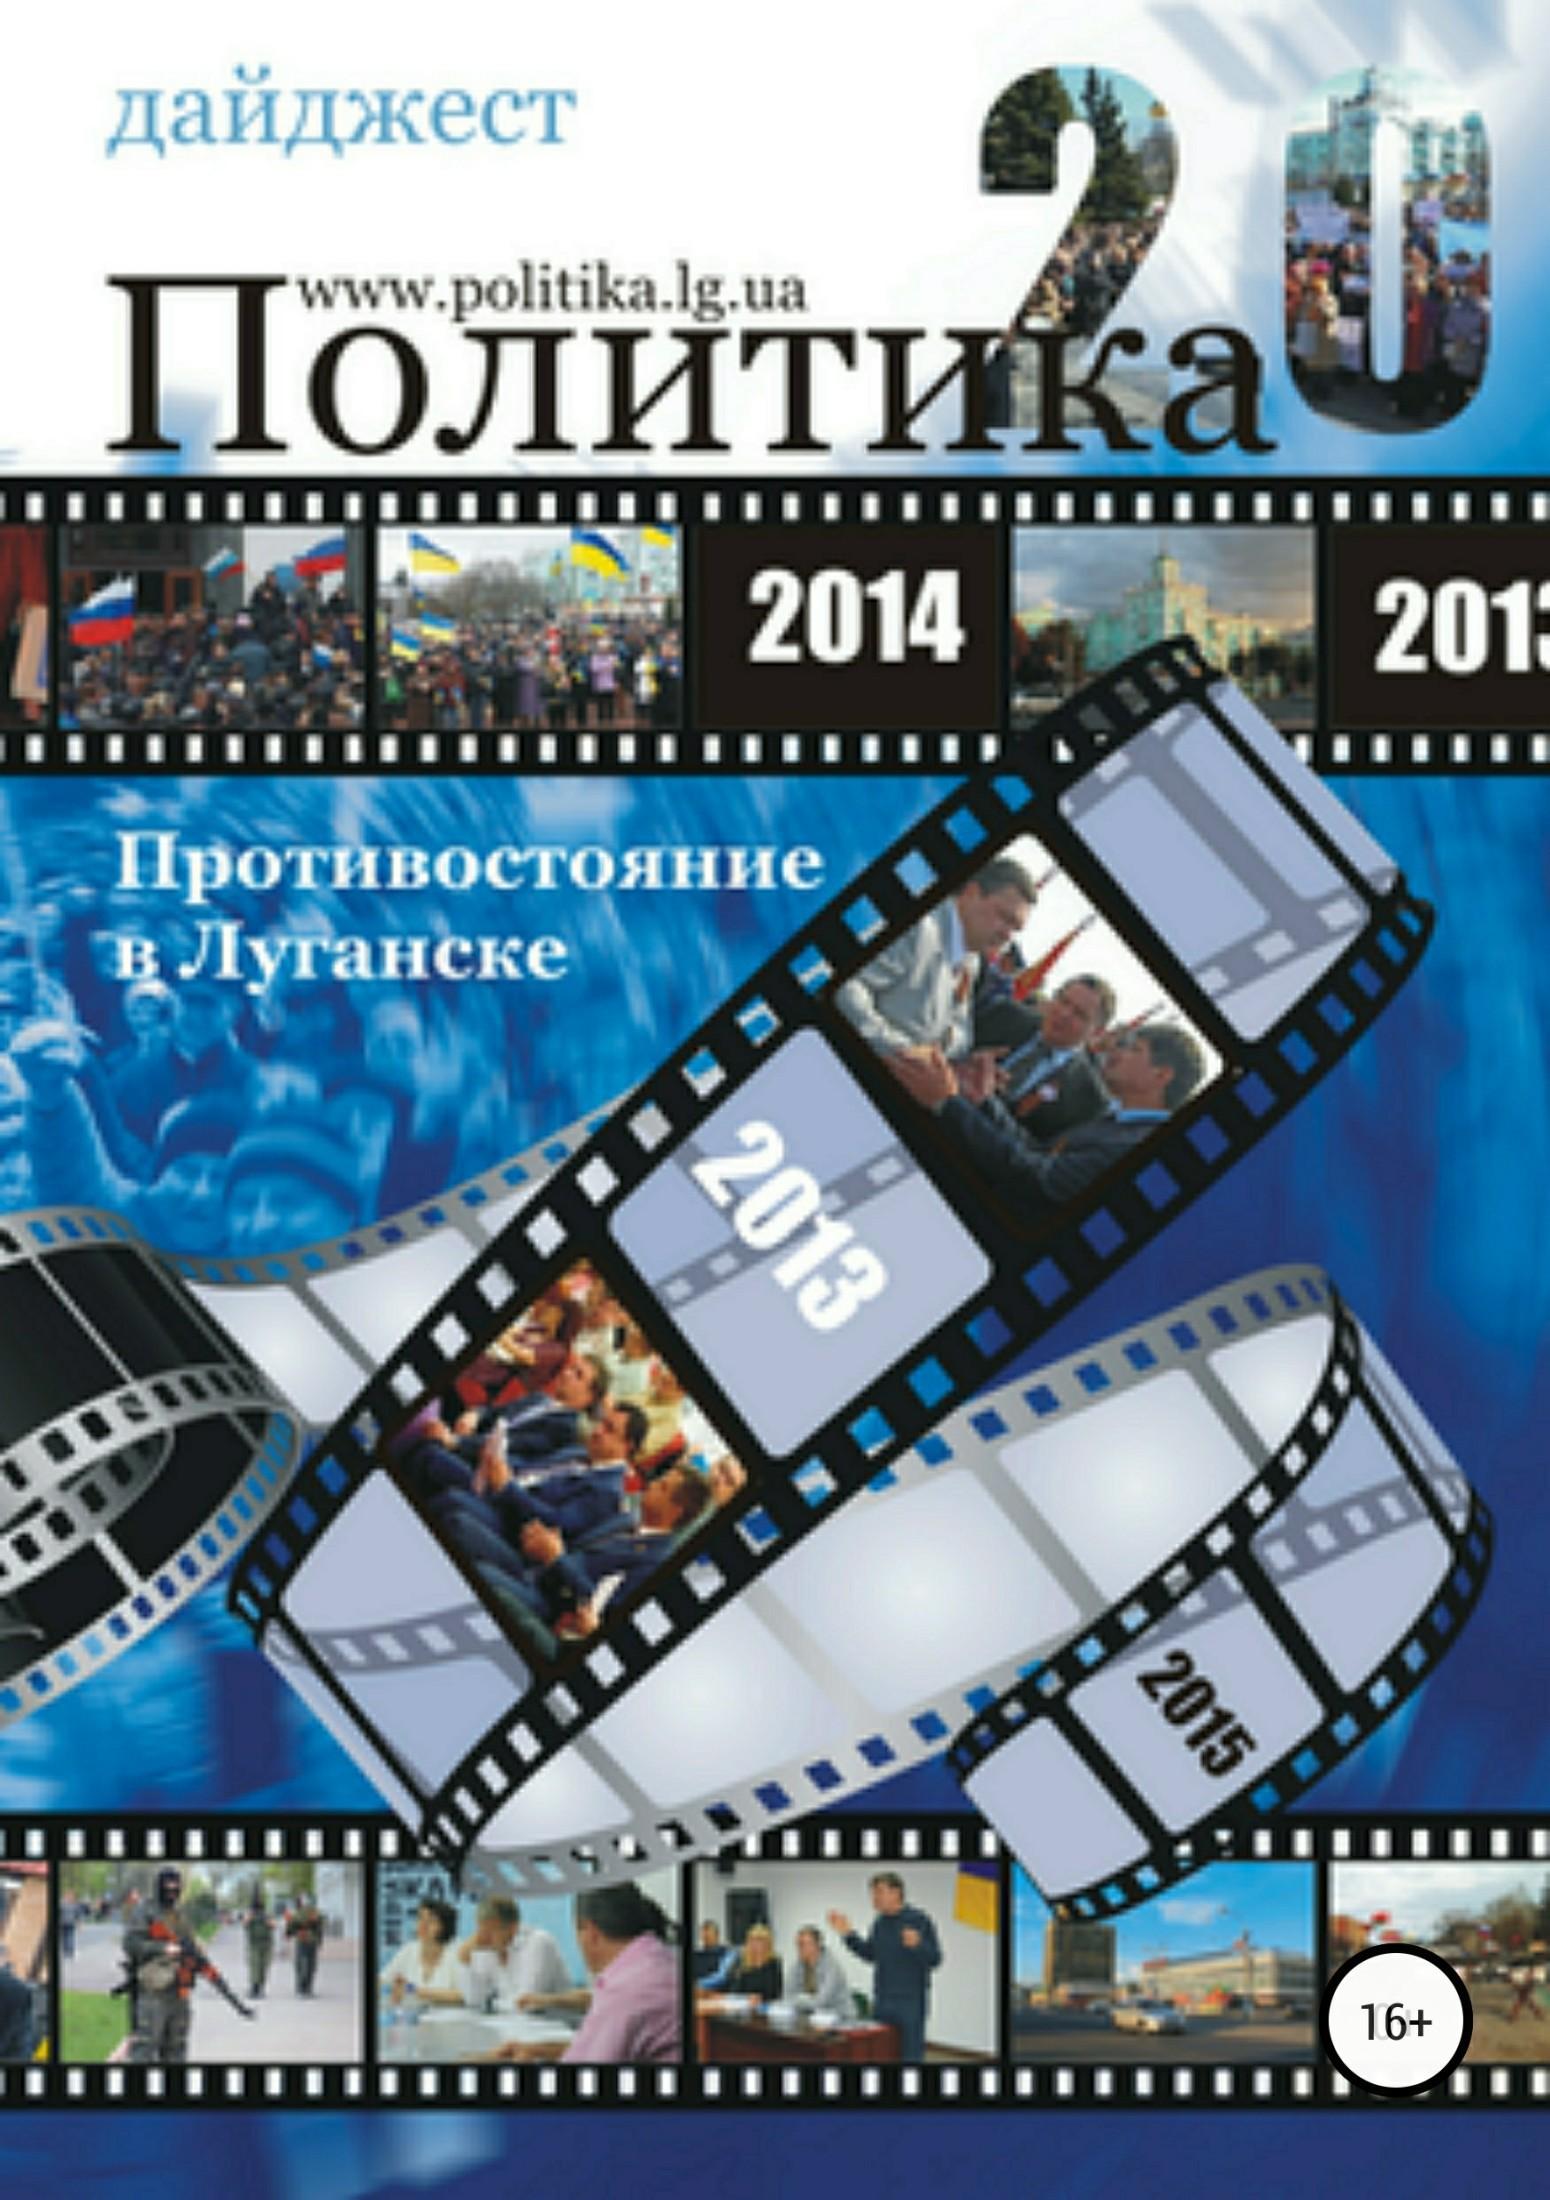 Саша Потёмкина Противостояние в Луганске – 2014. Дайджест